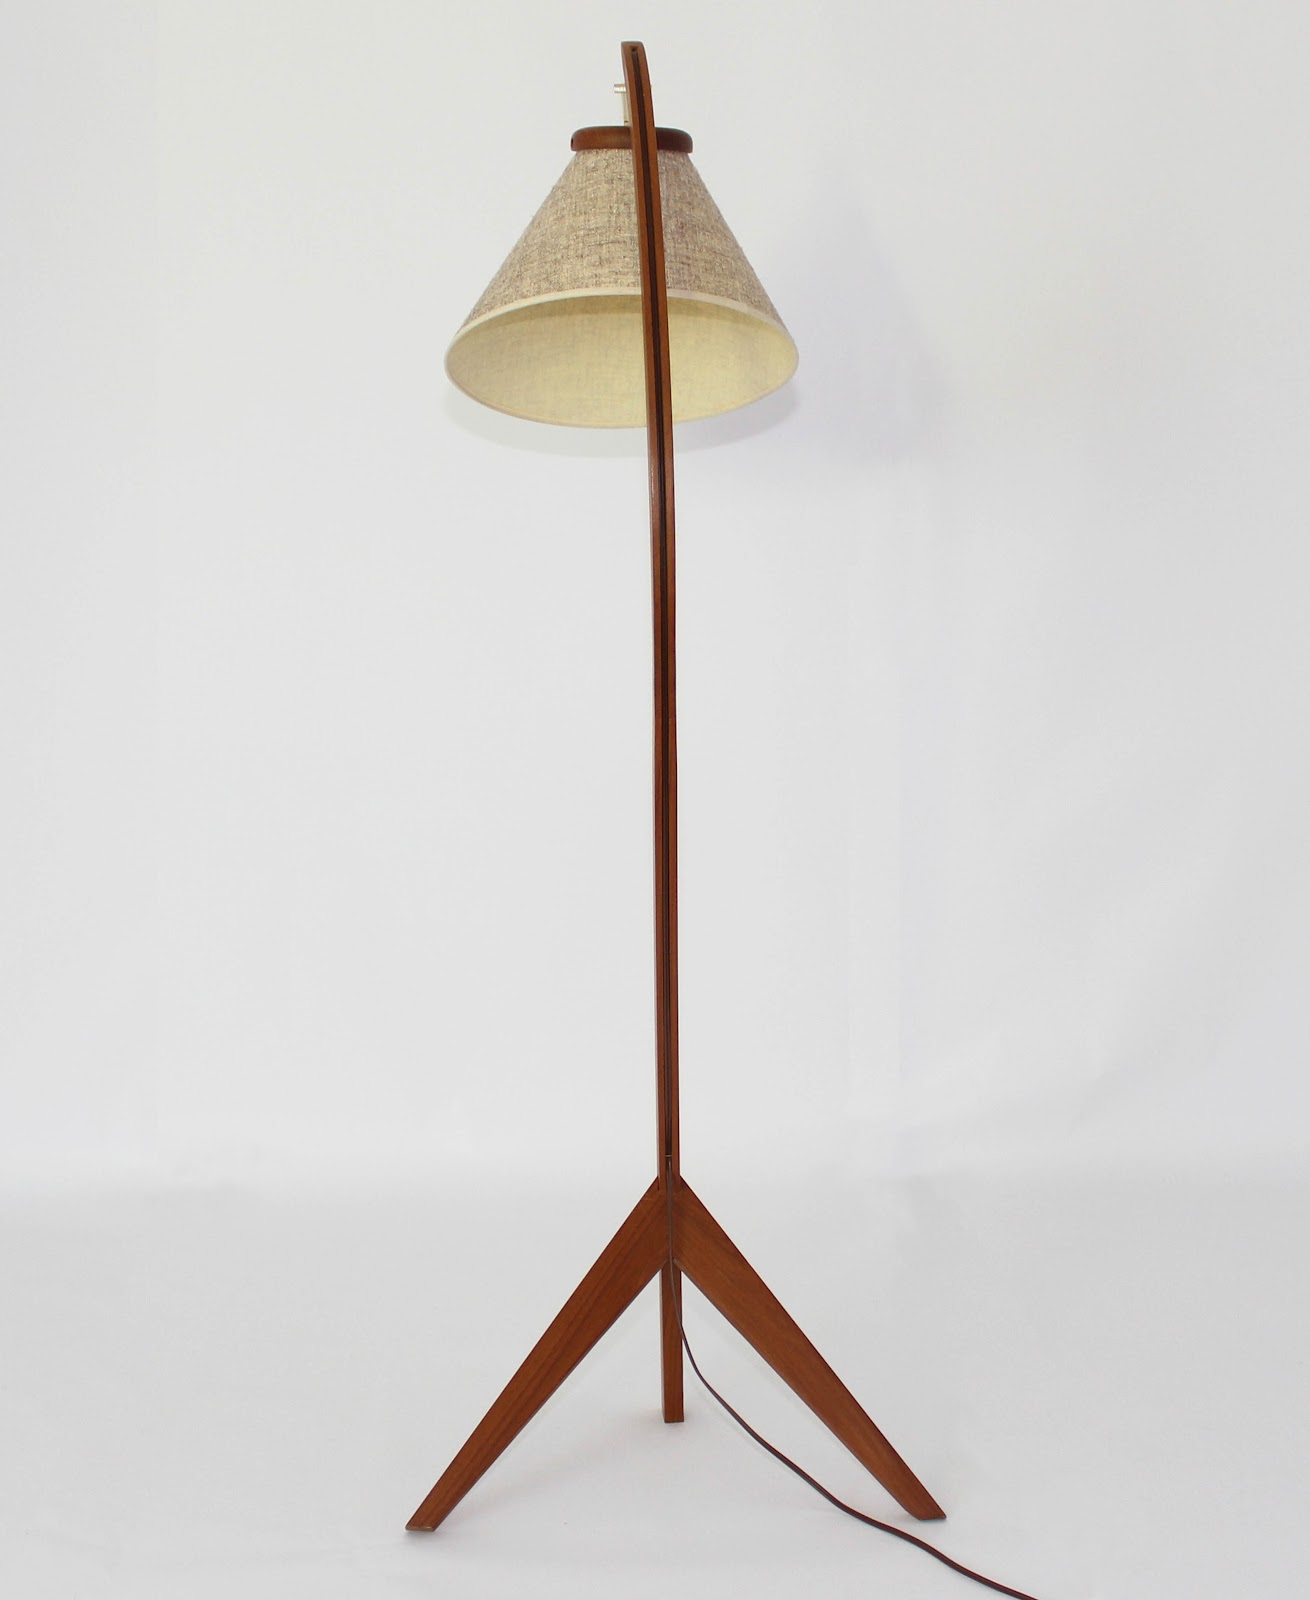 Mansion Decor: Mid Century Danish teak Bow Floor Lamp